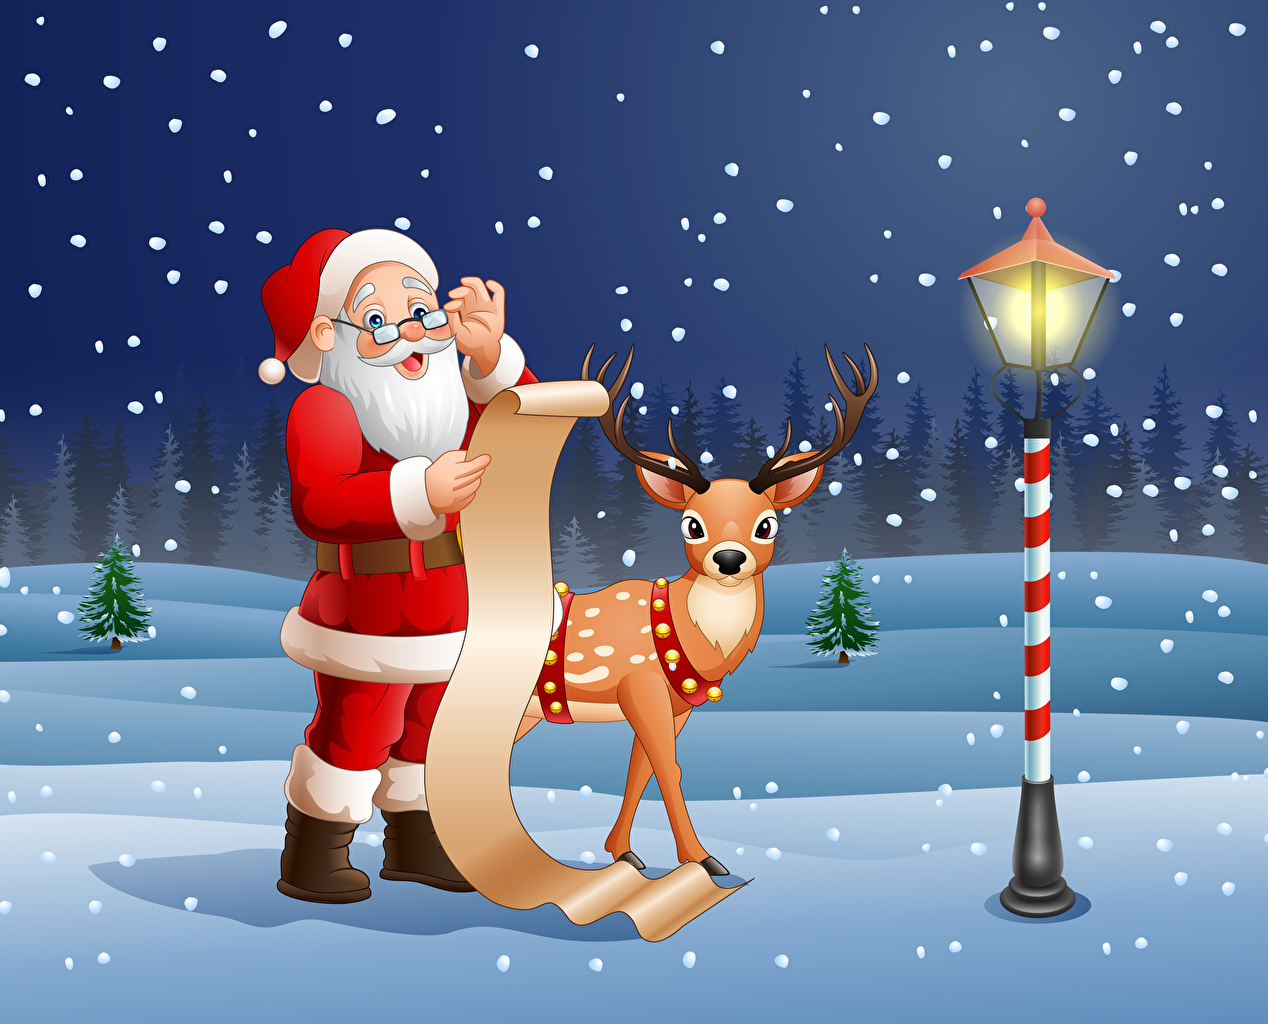 Photo Deer Christmas Sheet of paper bearded Santa Claus Snow Glasses Uniform Street lights Vector Graphics New year Beard beards eyeglasses